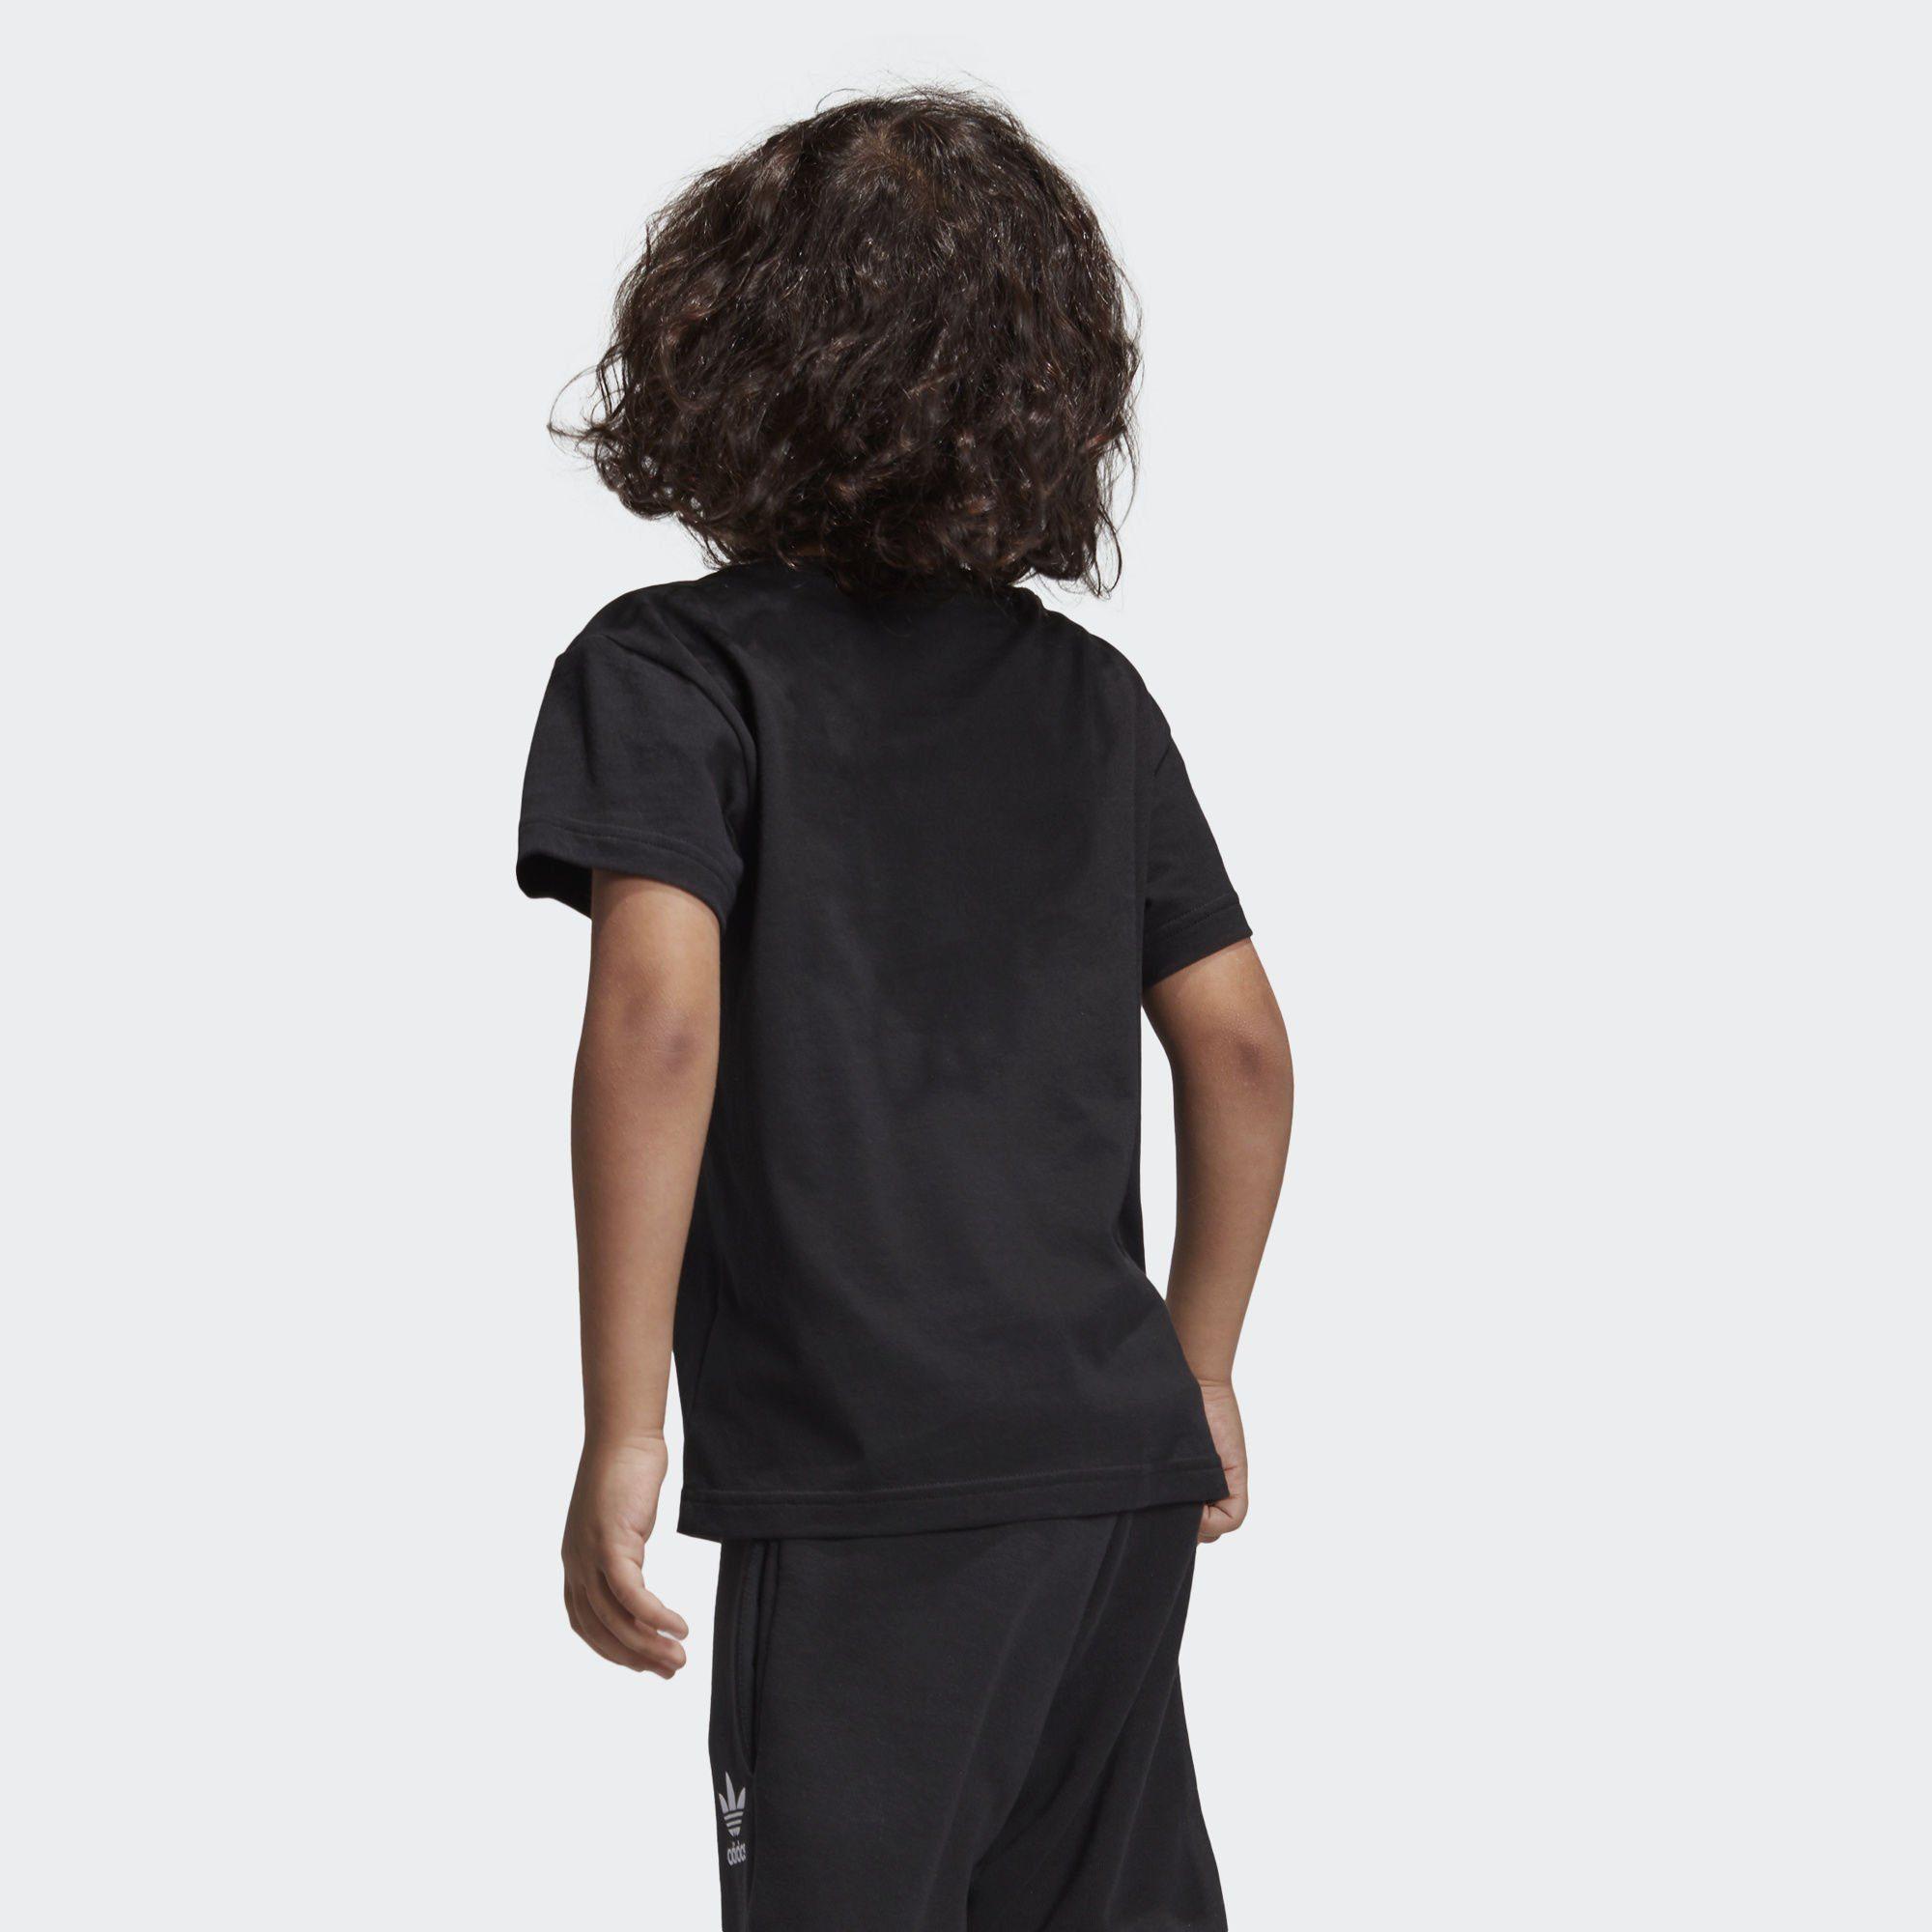 ADIDAS Kinder 3 Streifen Club T Shirt